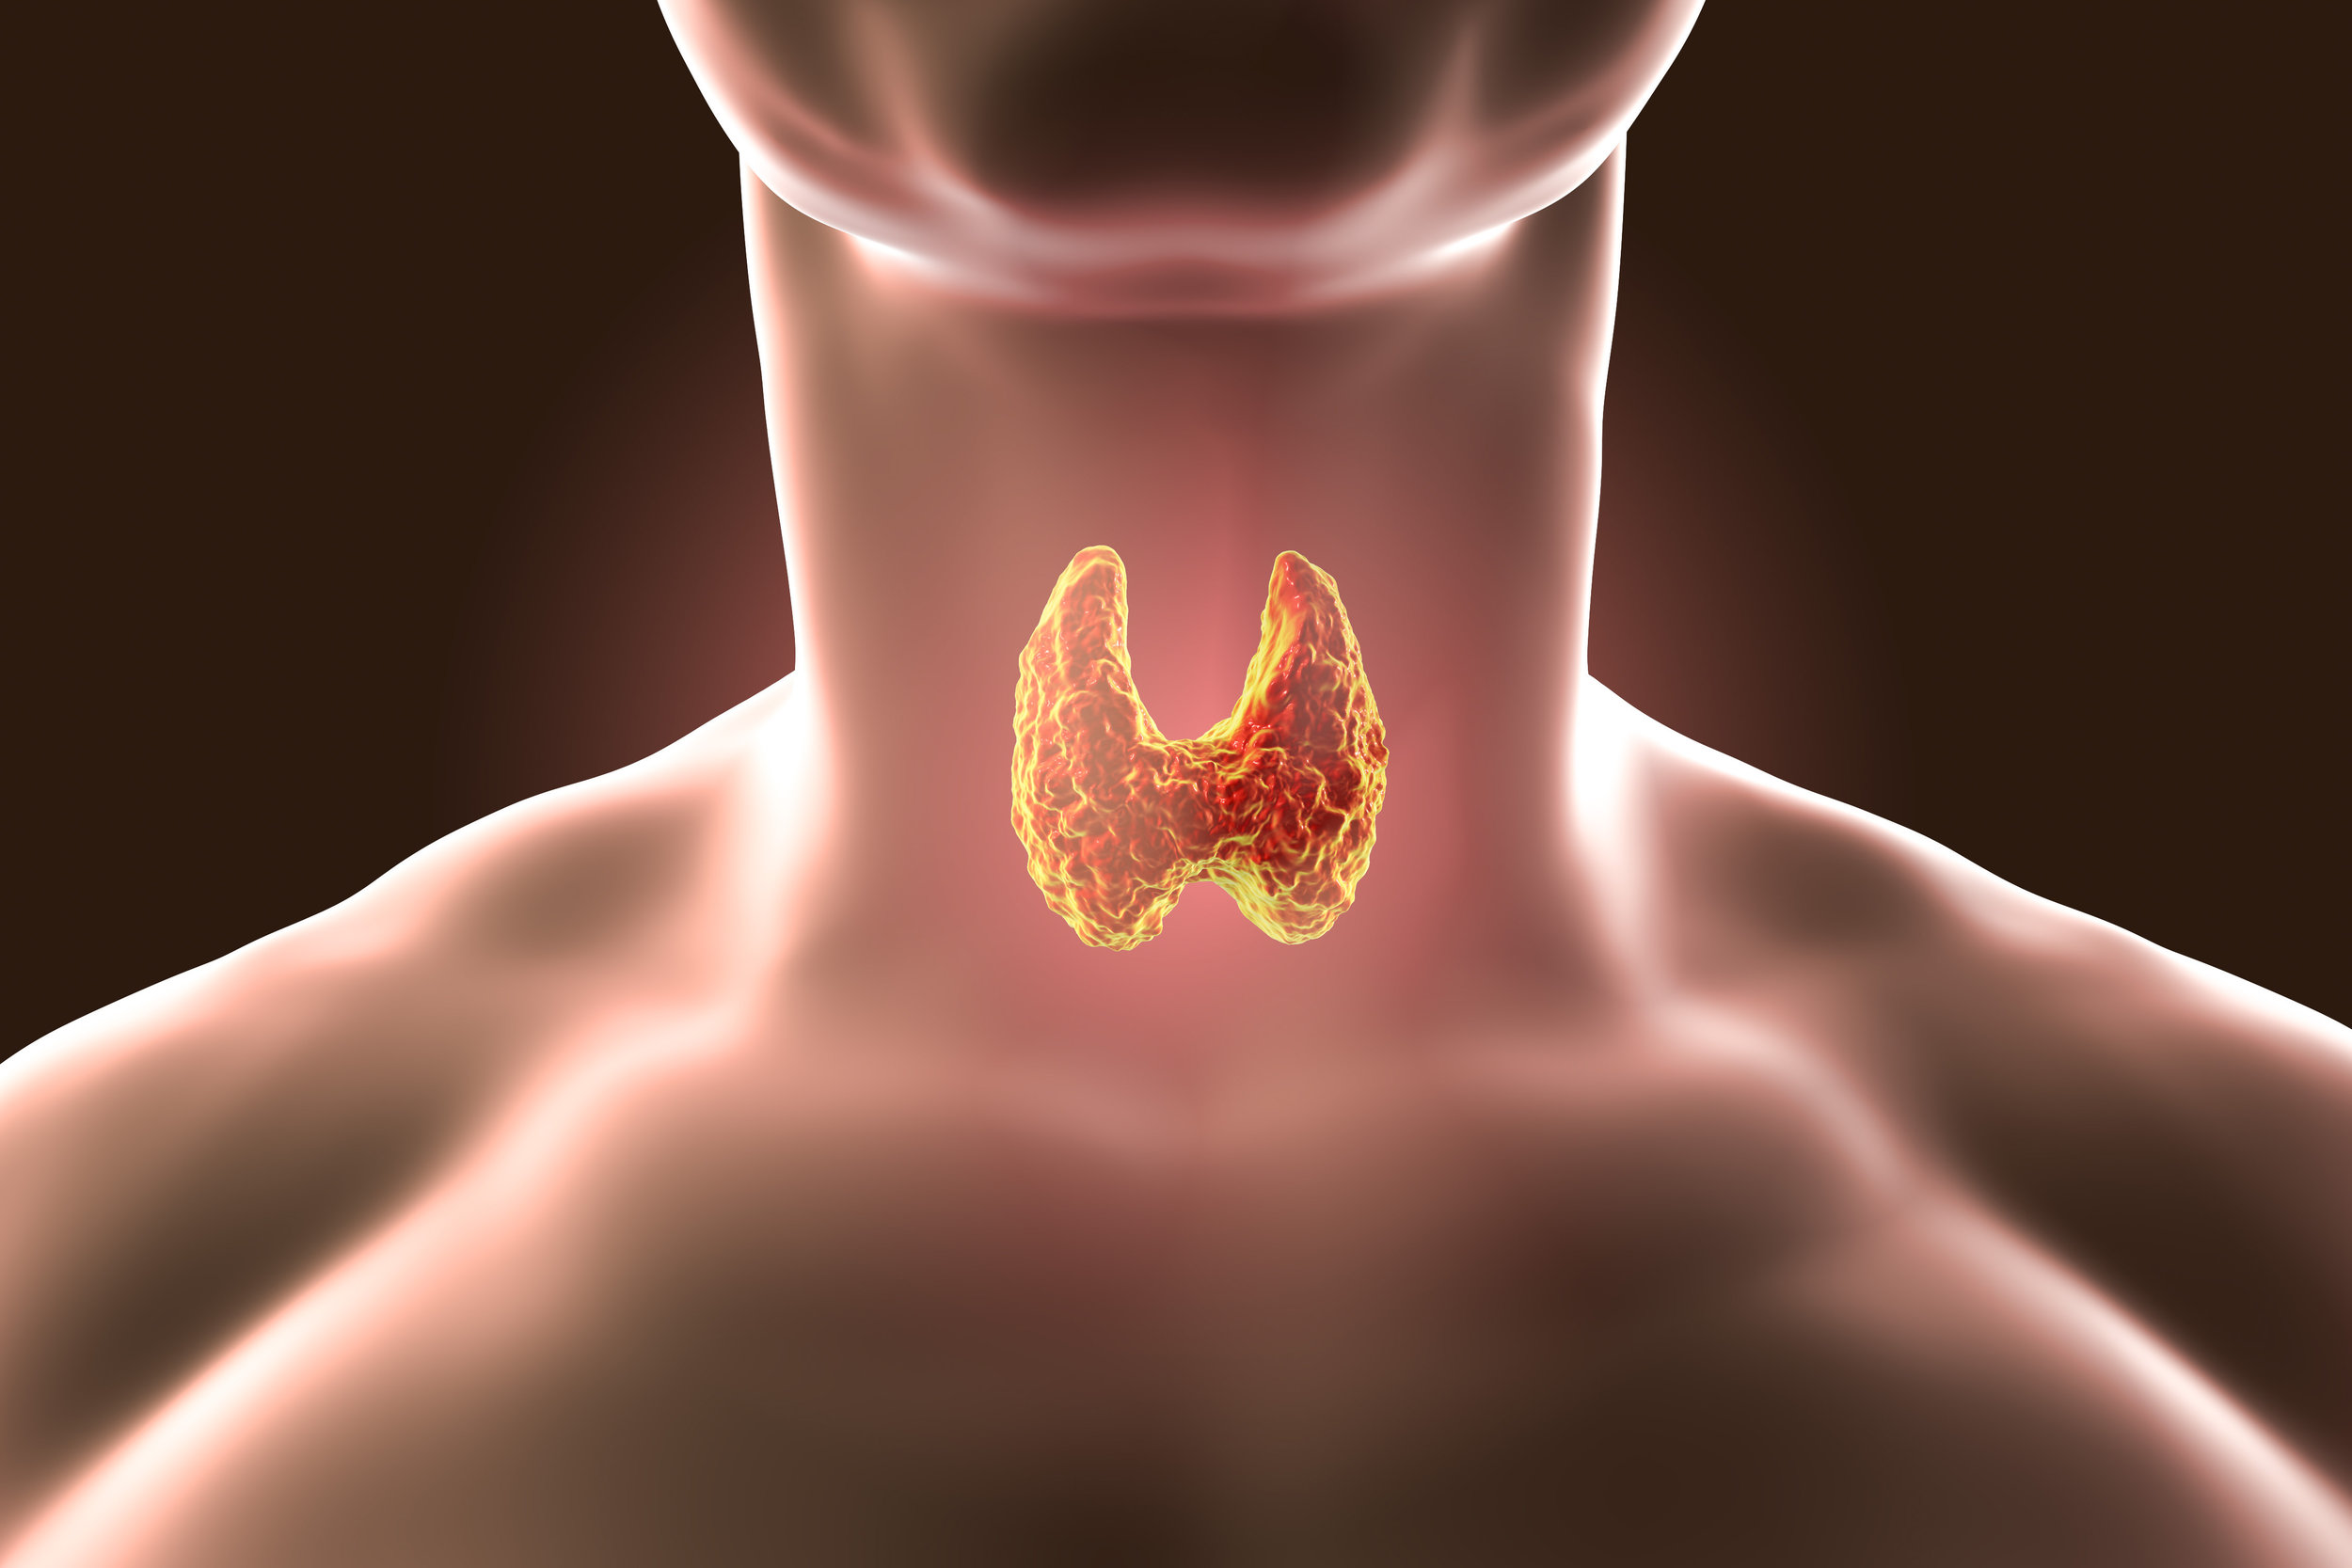 Thyroid image 2.jpg